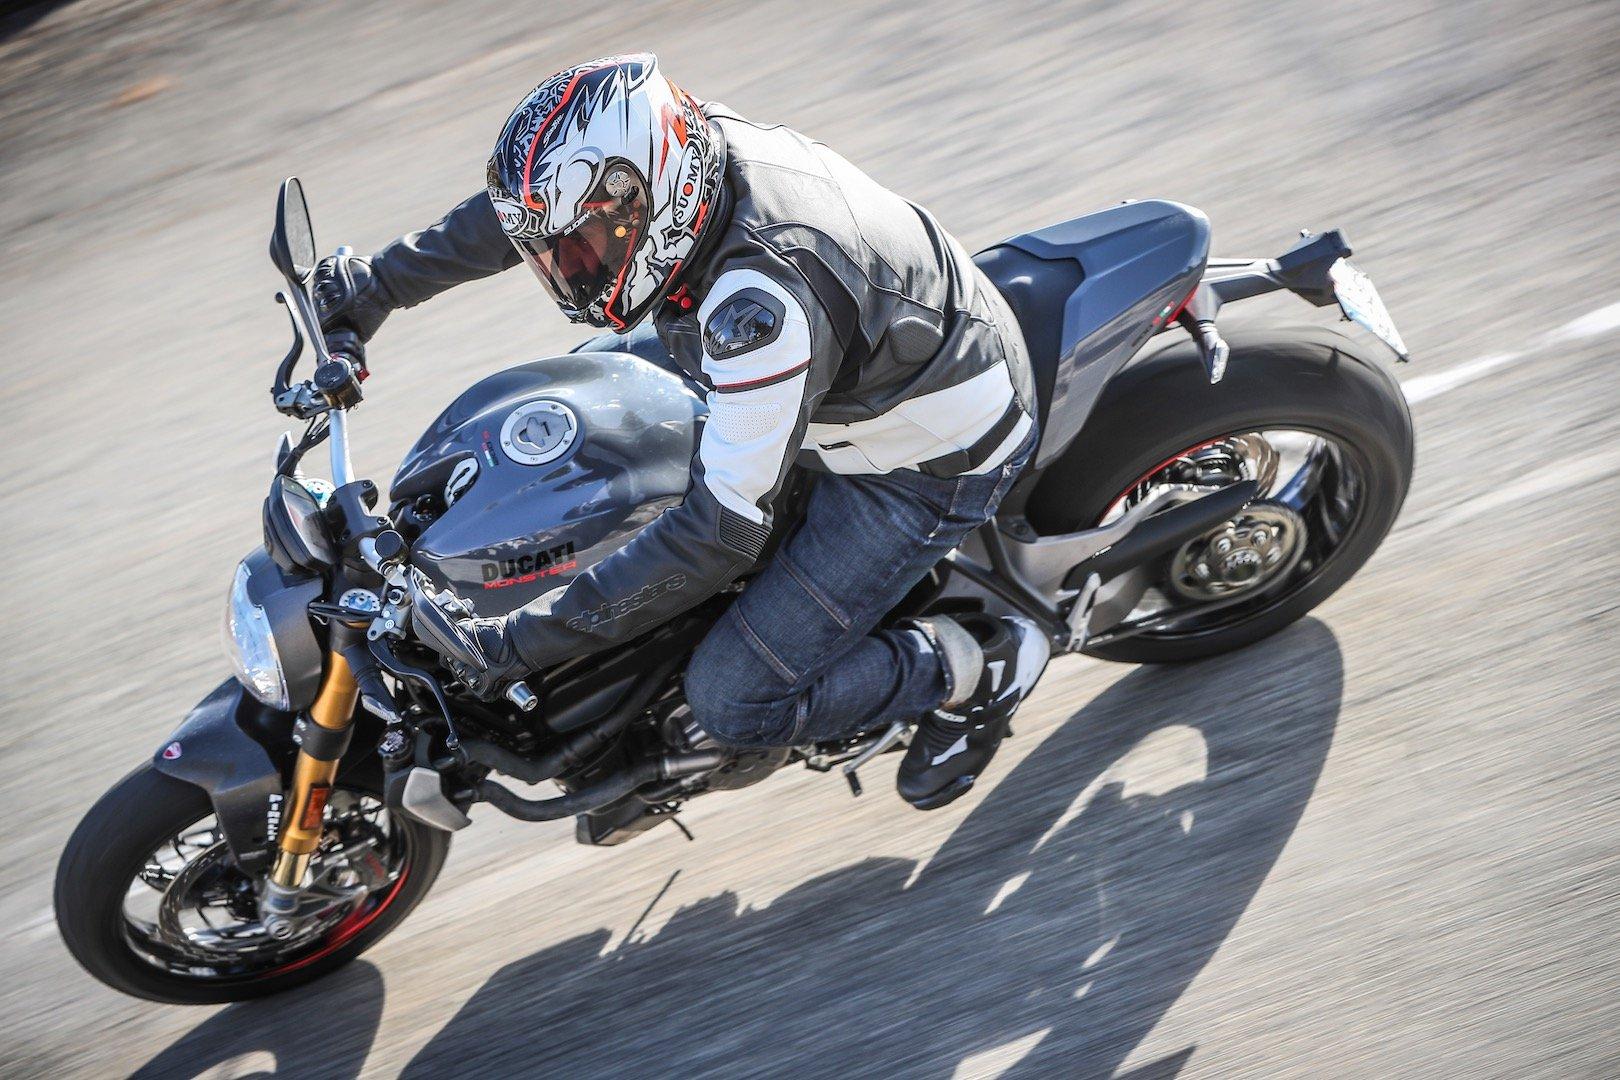 Ducati monster 1200 price